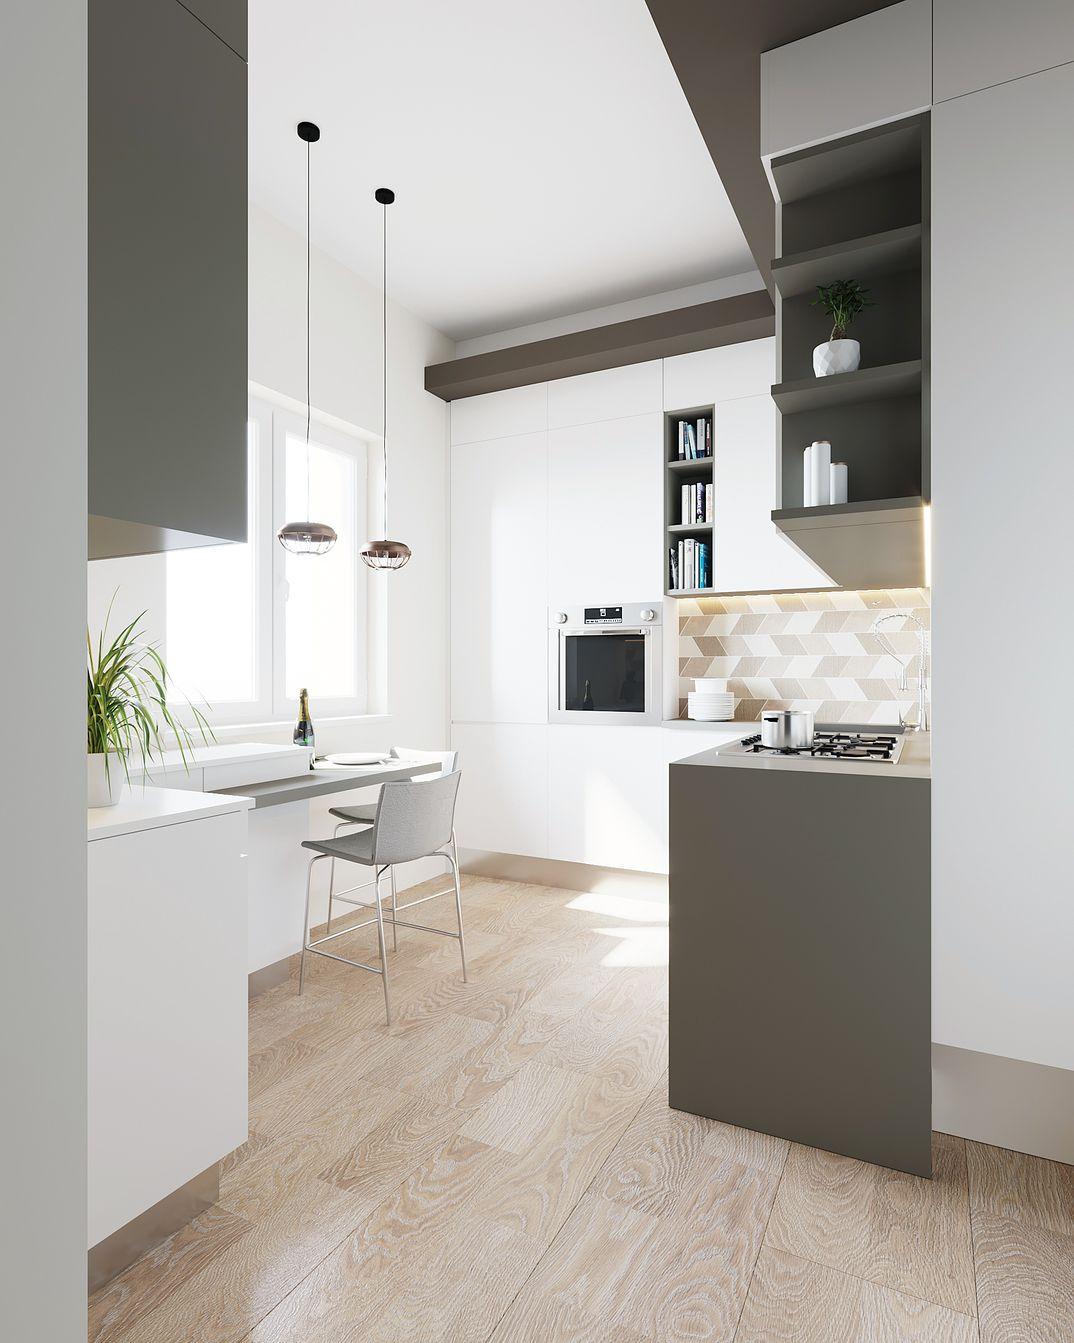 Kitchen in Pescara